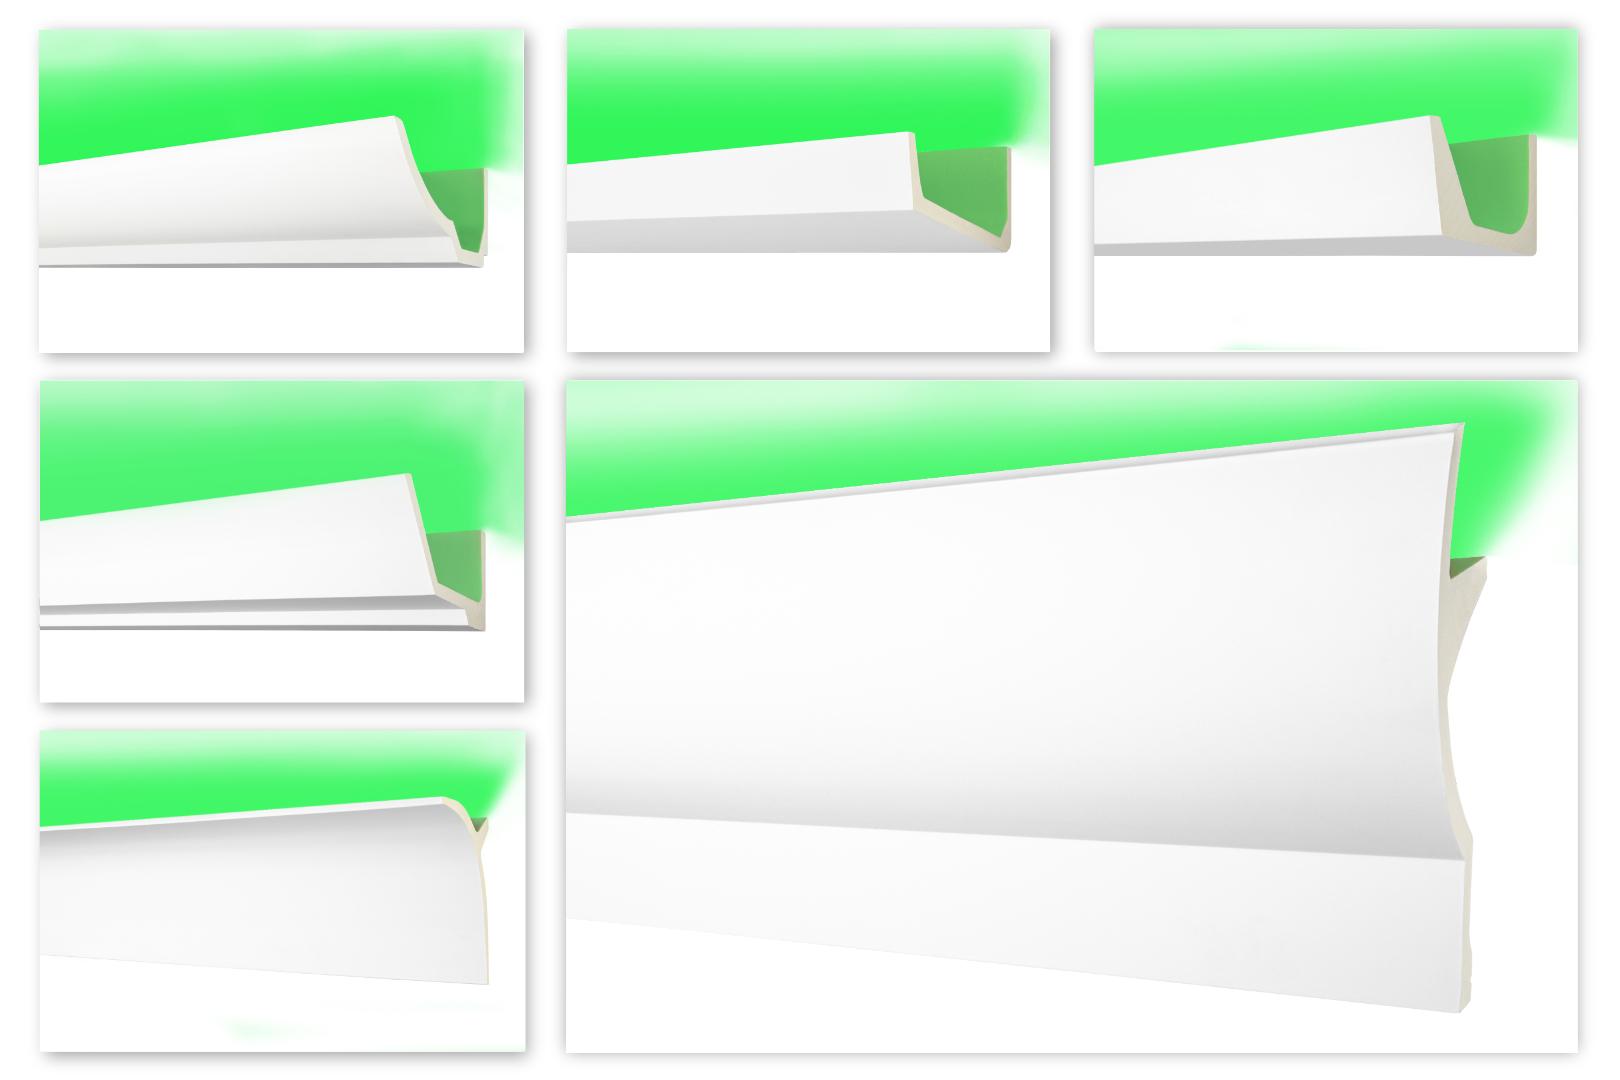 2 Meter LED Zierleiste, Stuckleiste aus PU glatt, stoßfest - Perfect AB - alle Modelle